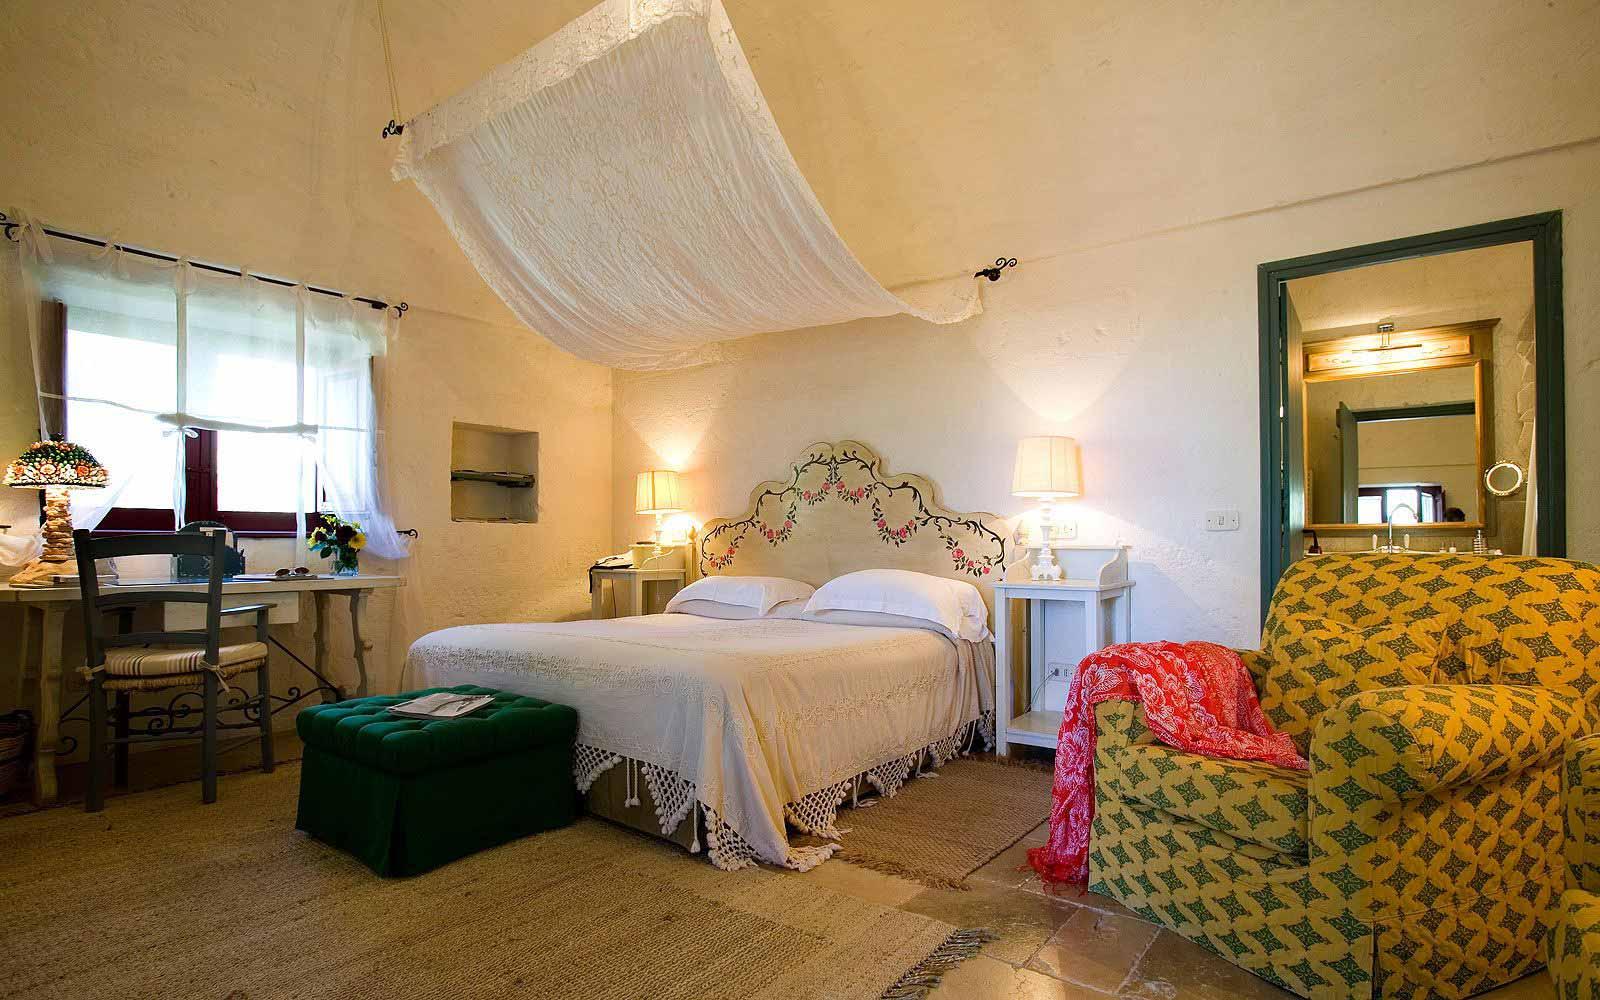 Deluxe room at Masseria Torre Coccaro